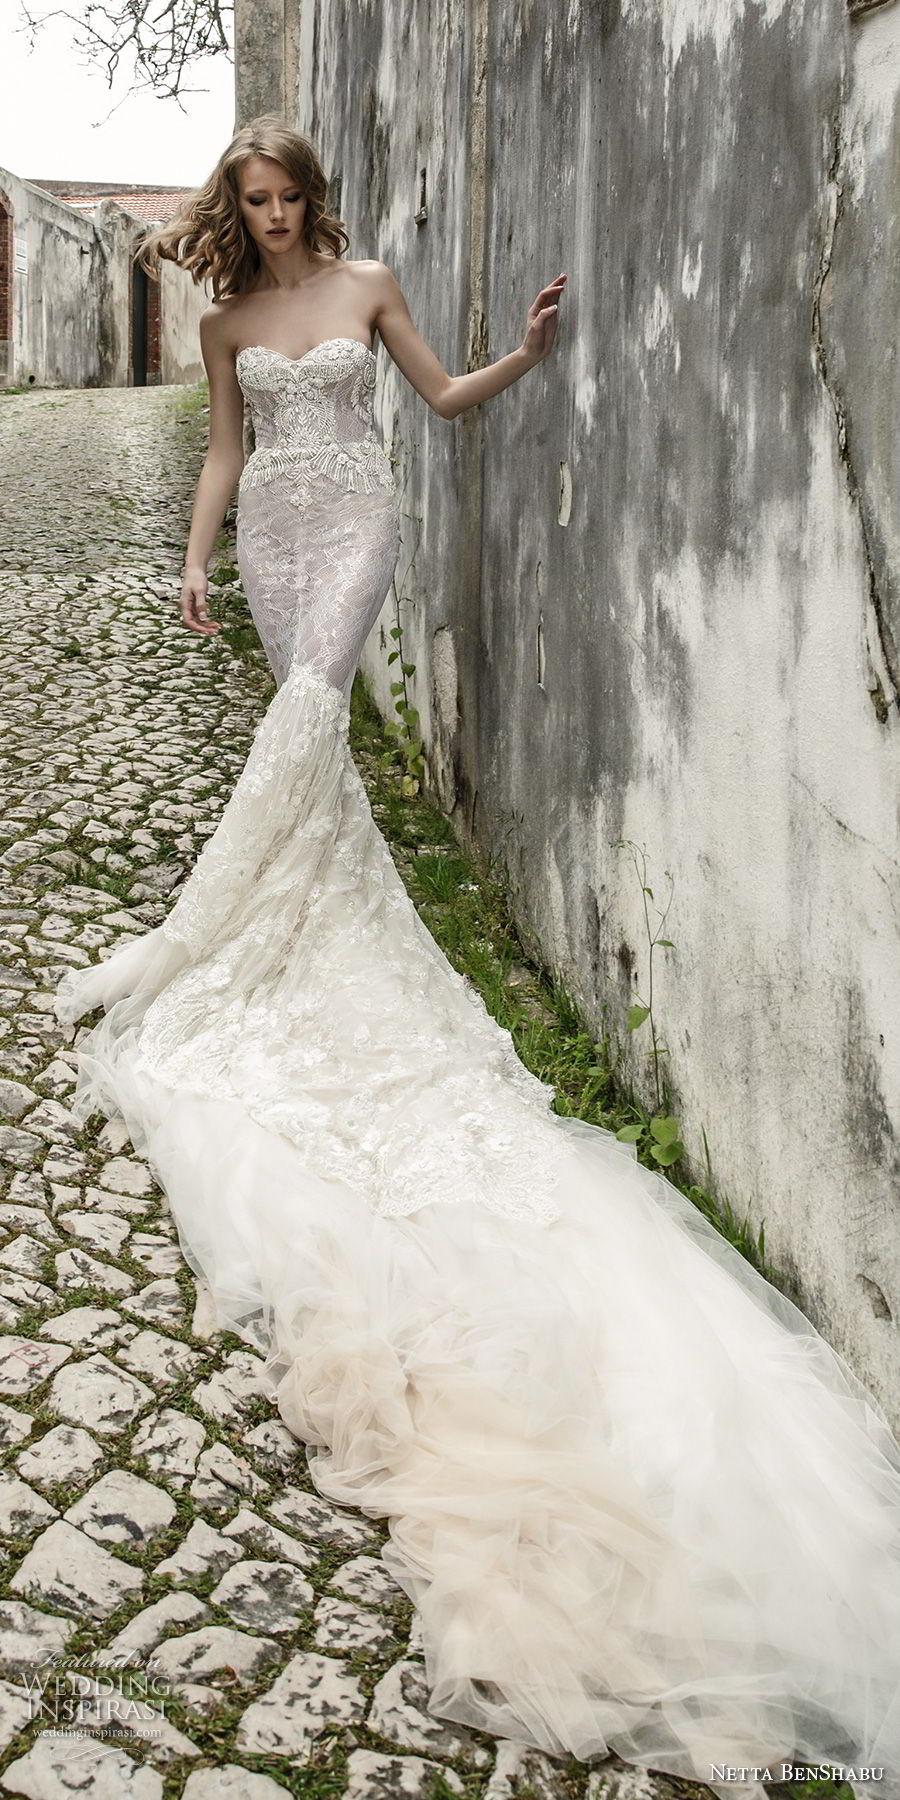 netta benshabu 2017 bridal strapless sweetheart neckline full embellishment elegant sexy fit and flare mermaid wedding dress chapel train (20) mv